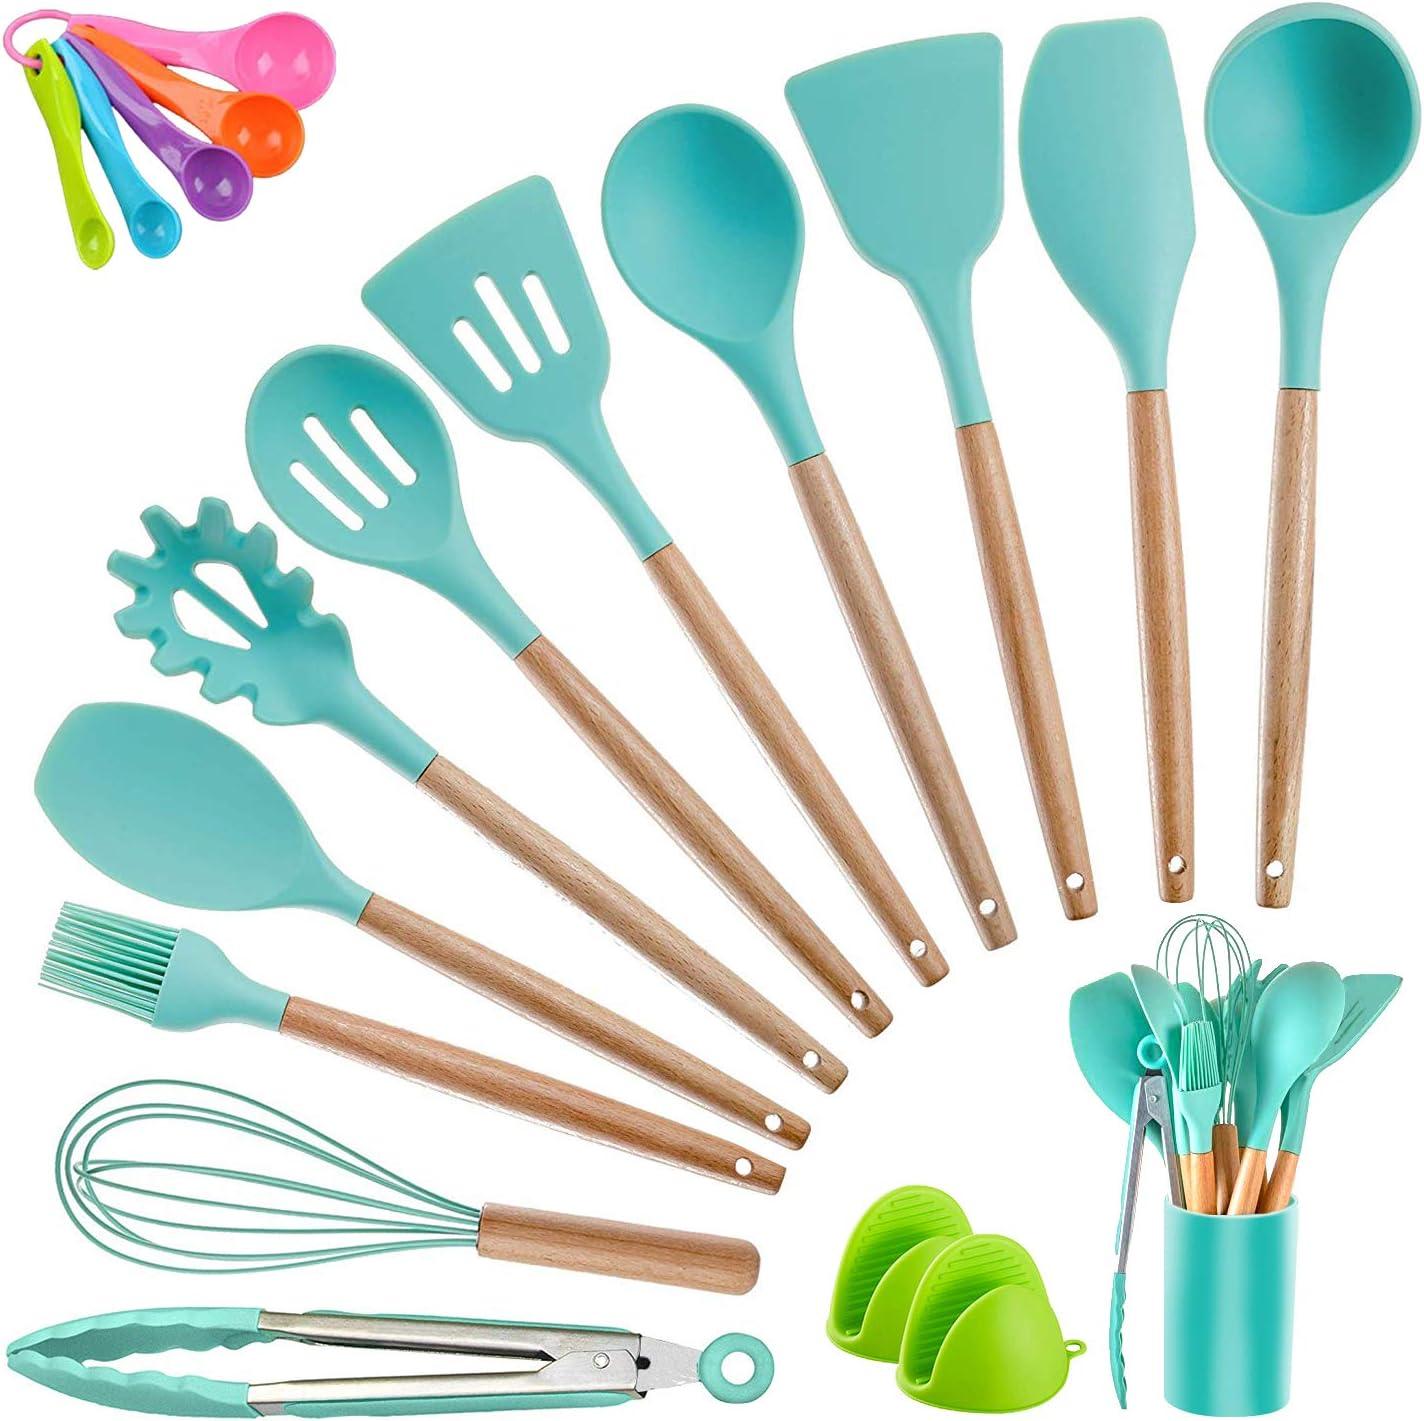 Kitchen Utensil Set Silicone Cooking Utensils, CROSDE 5pcs Kitchen  Utensils Set Tools Wooden Handle Spoons Spatula Set Cookware Turner Tongs  Kitchen